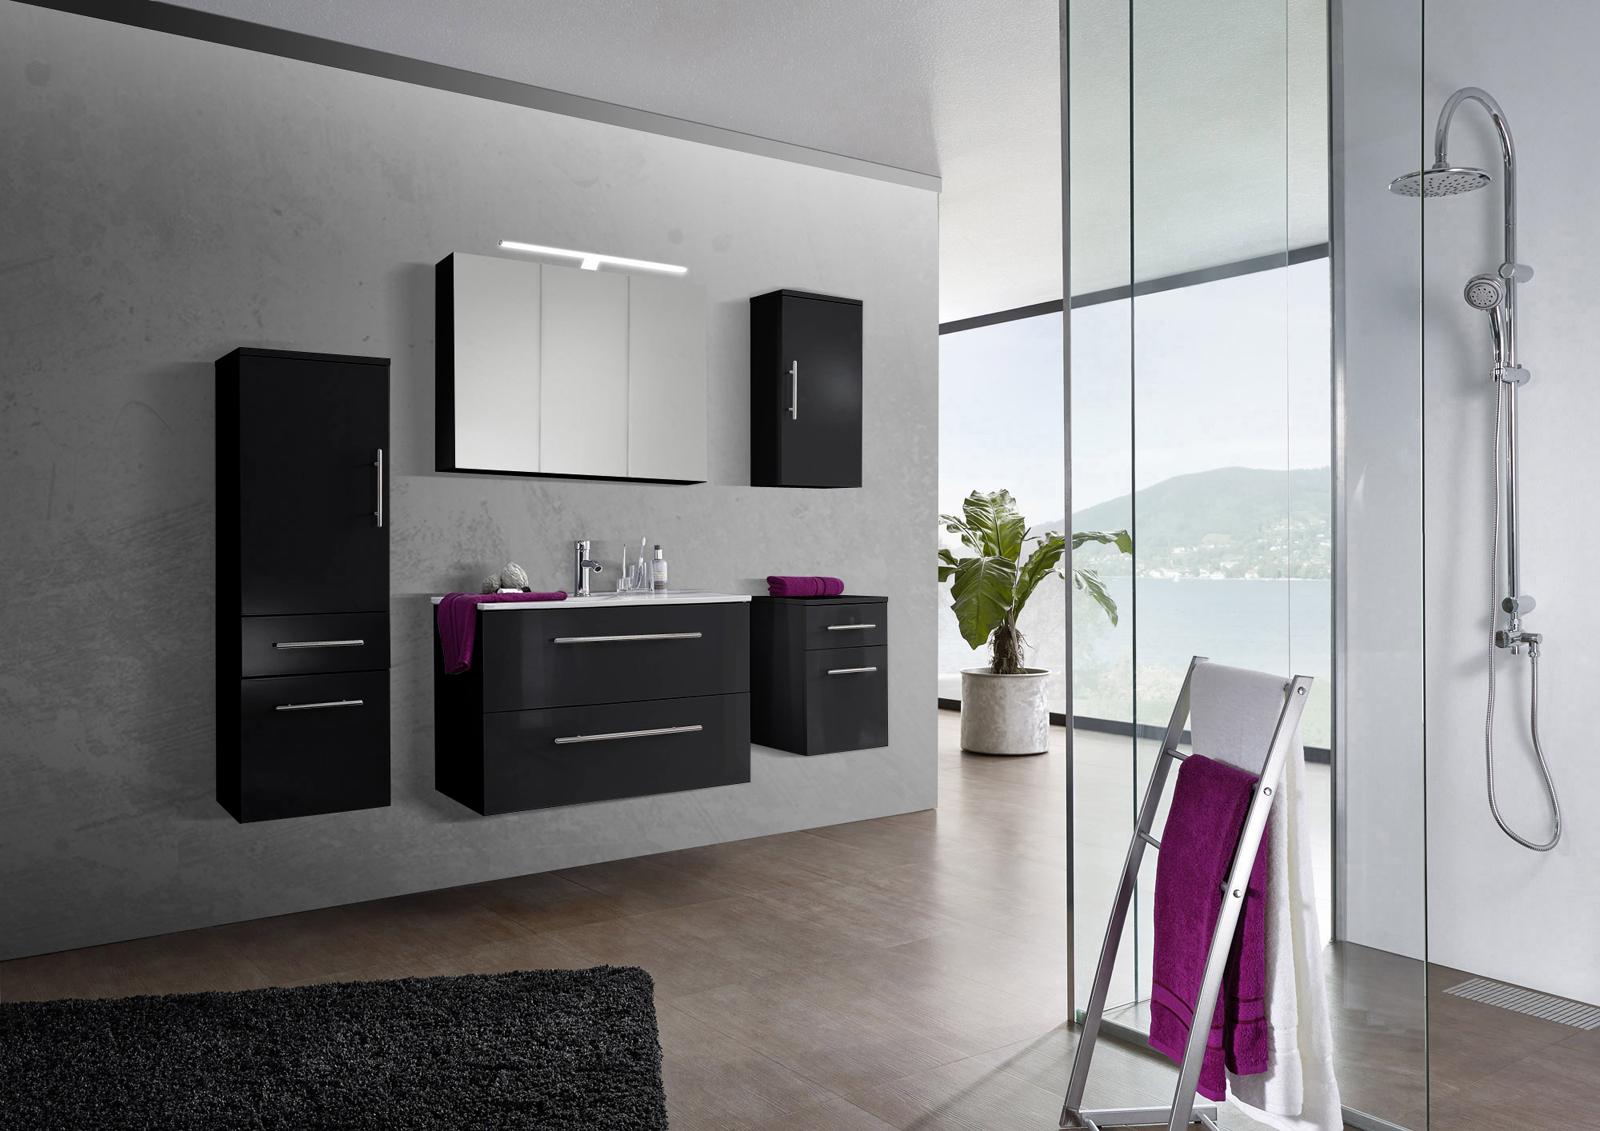 sam 5tlg badezimmer set spiegelschrank schwarz 90 cm. Black Bedroom Furniture Sets. Home Design Ideas